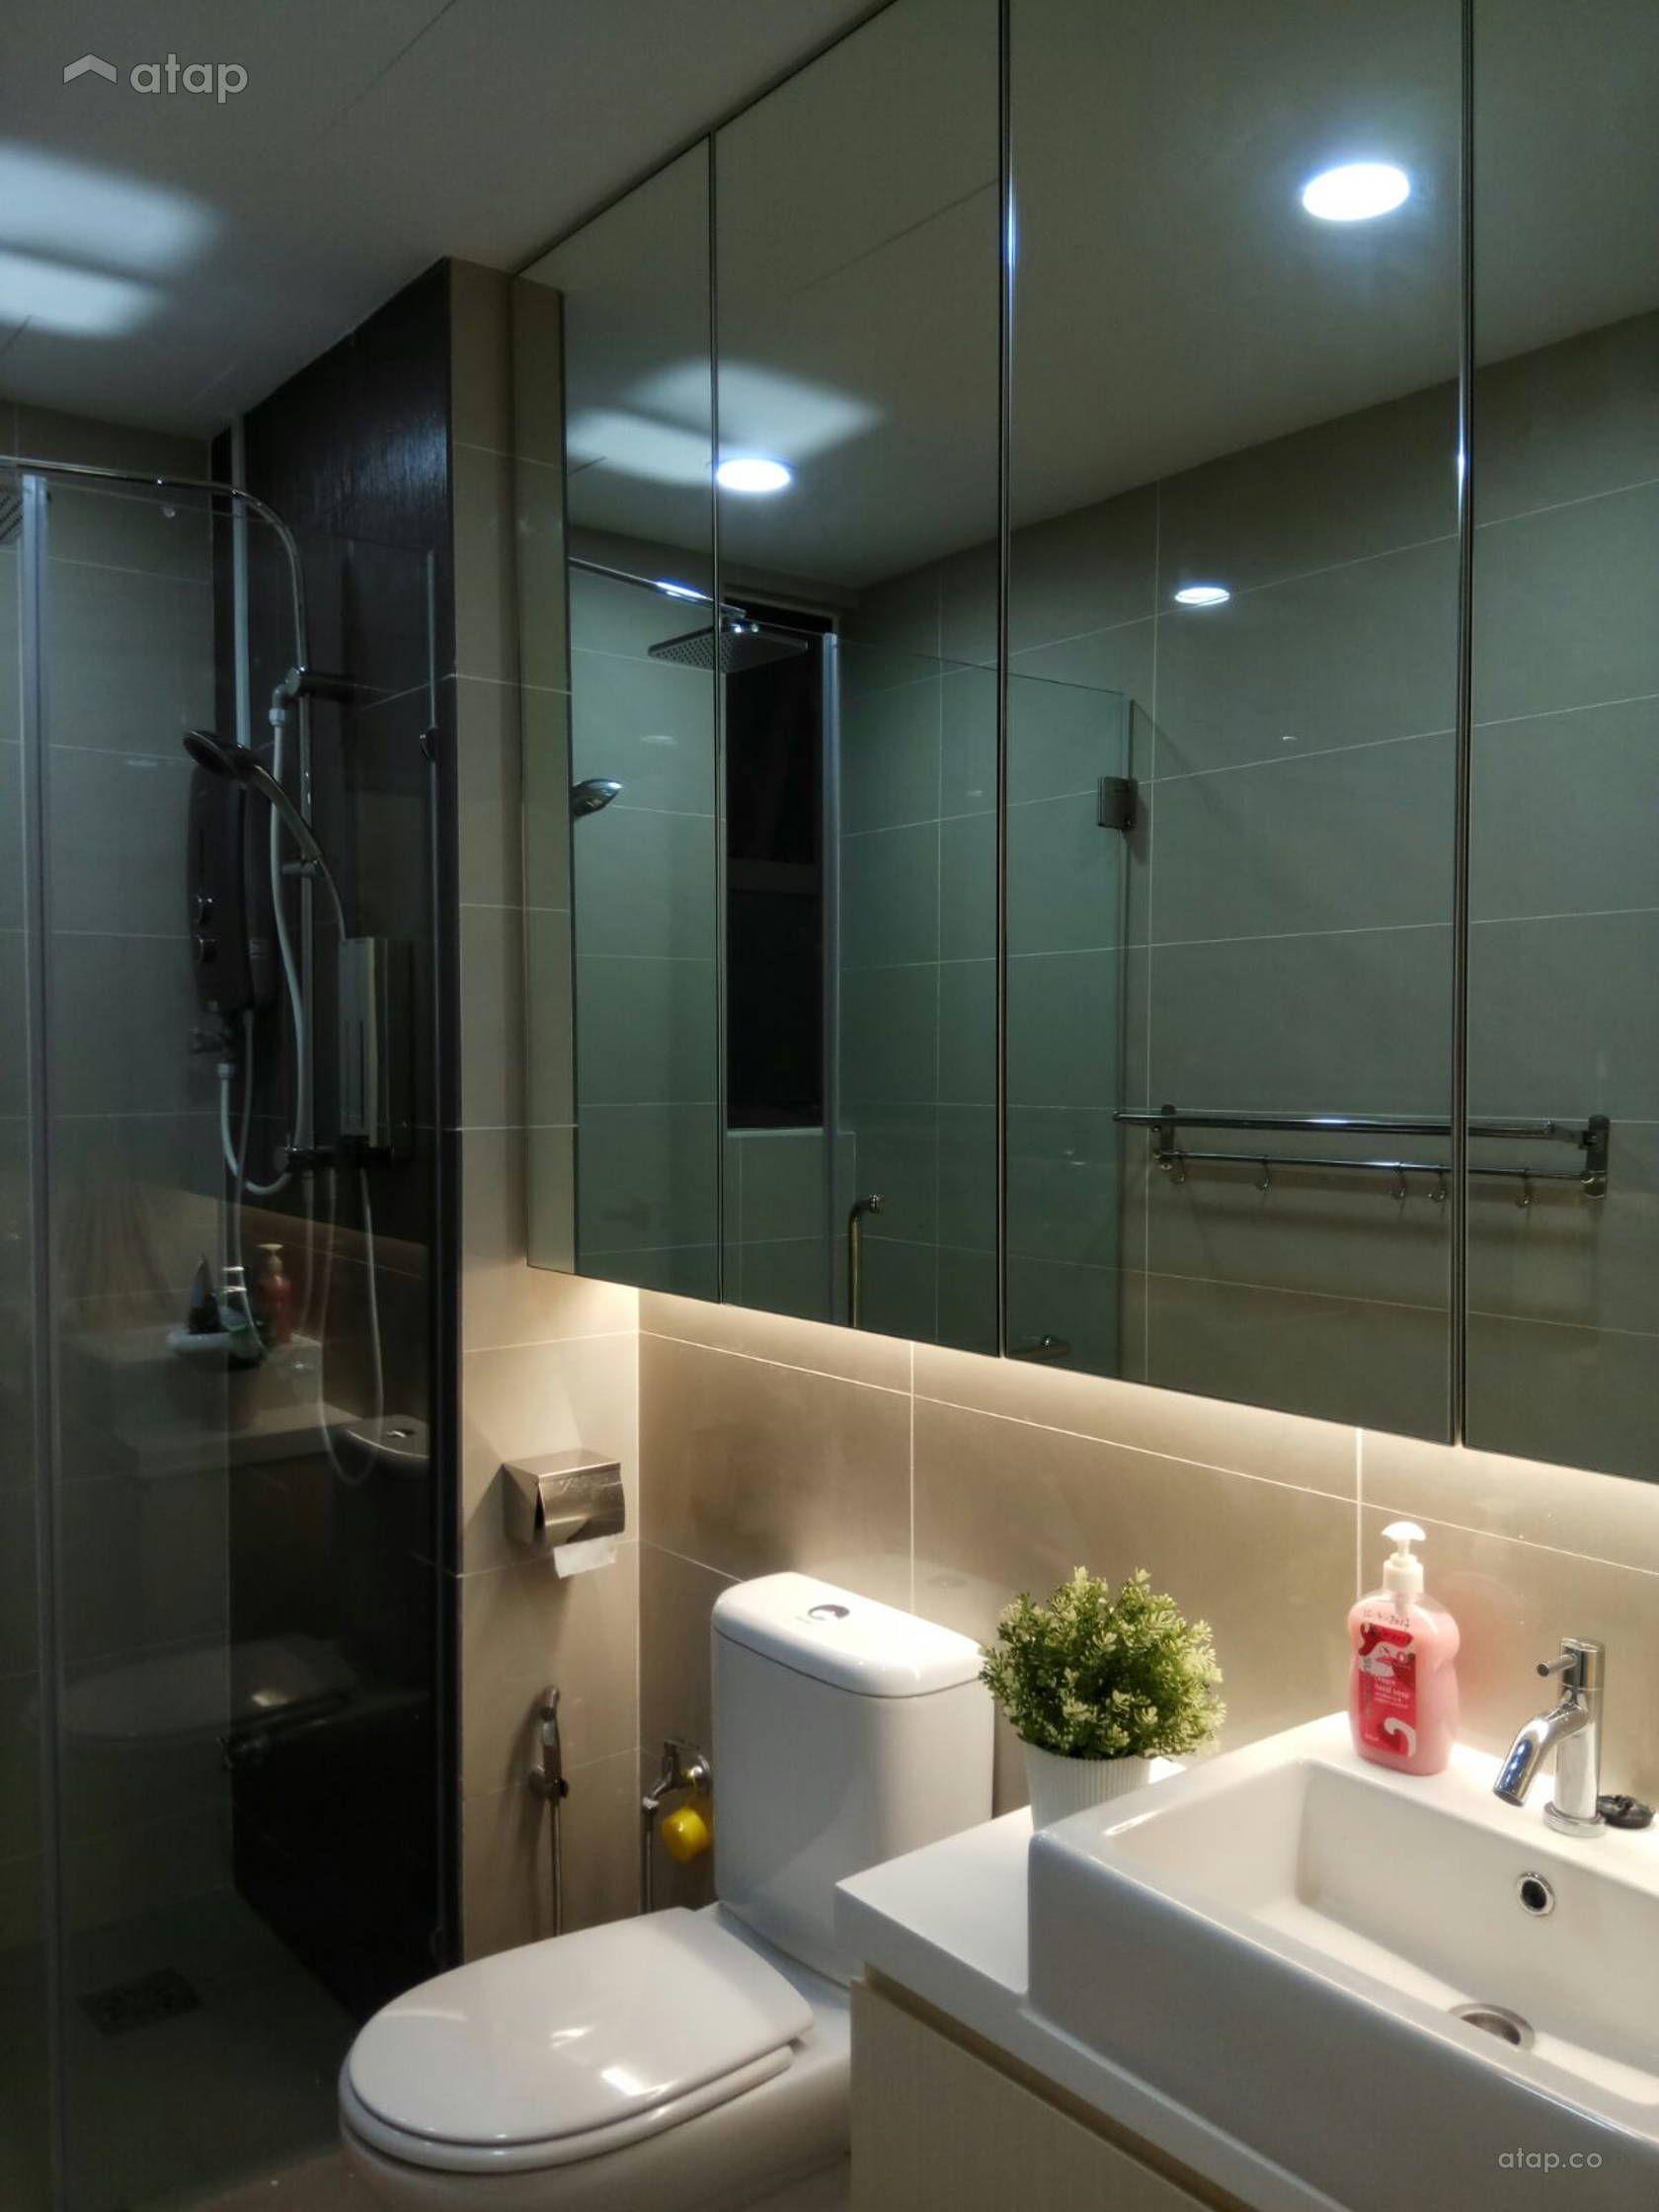 Modern Bathroom Apartment Design Ideas Photos Malaysia Atap Co Bathroom Design Inspiration Modern Bathroom Stylish Bathroom